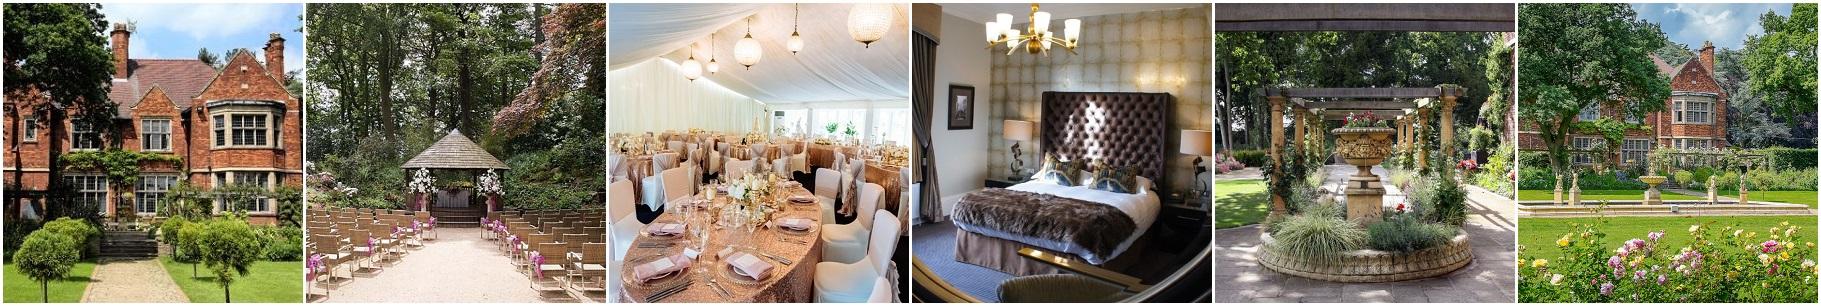 Wedding Venues West Midlands